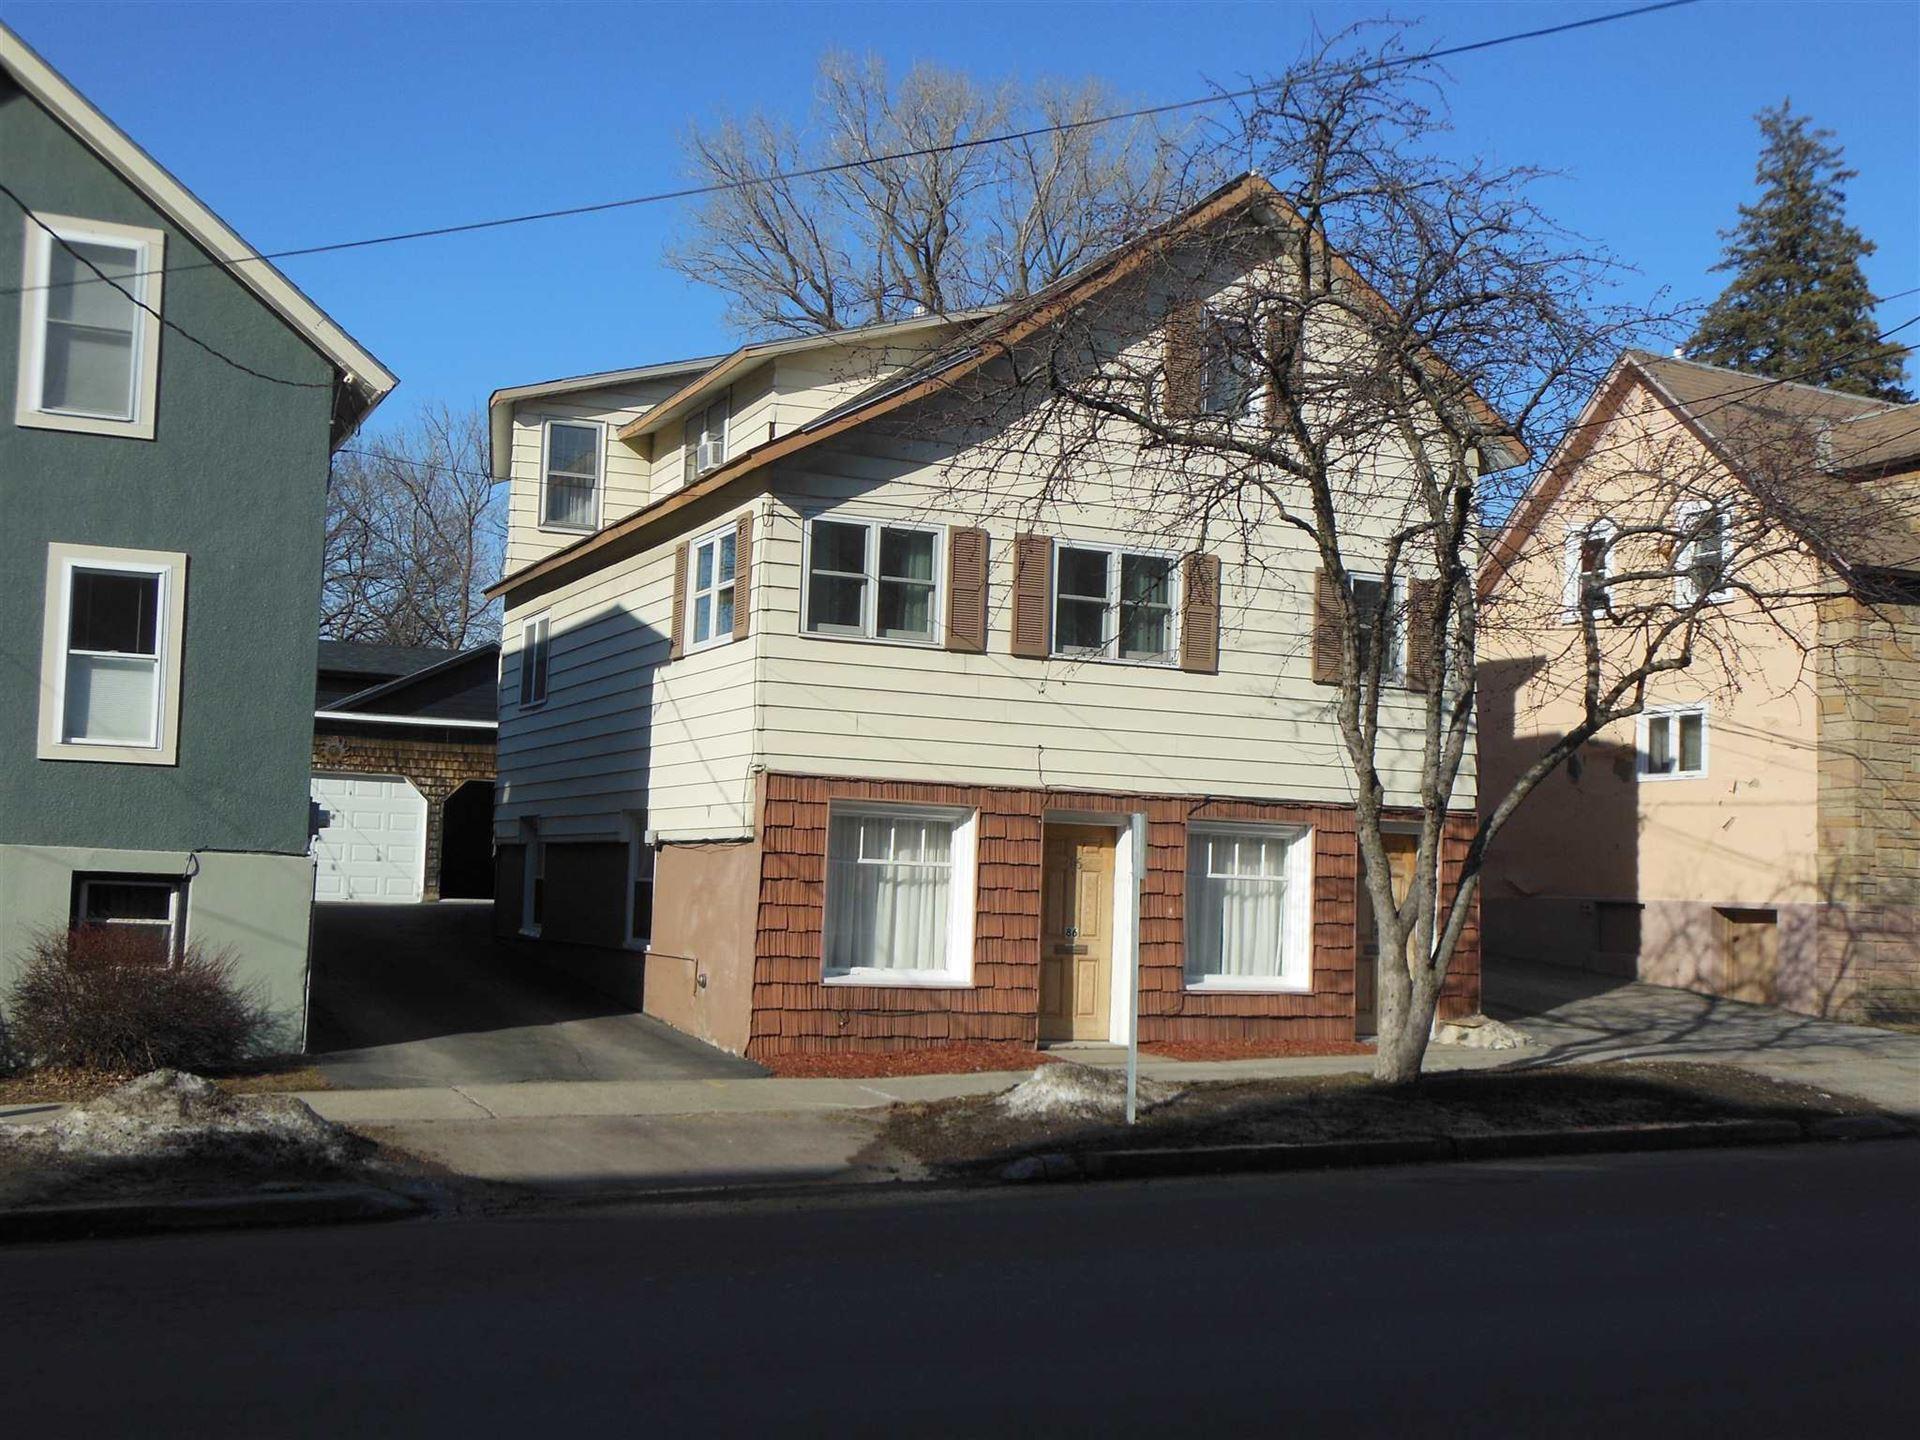 84-86 Maple Street, Burlington, VT 05401 - MLS#: 4851293